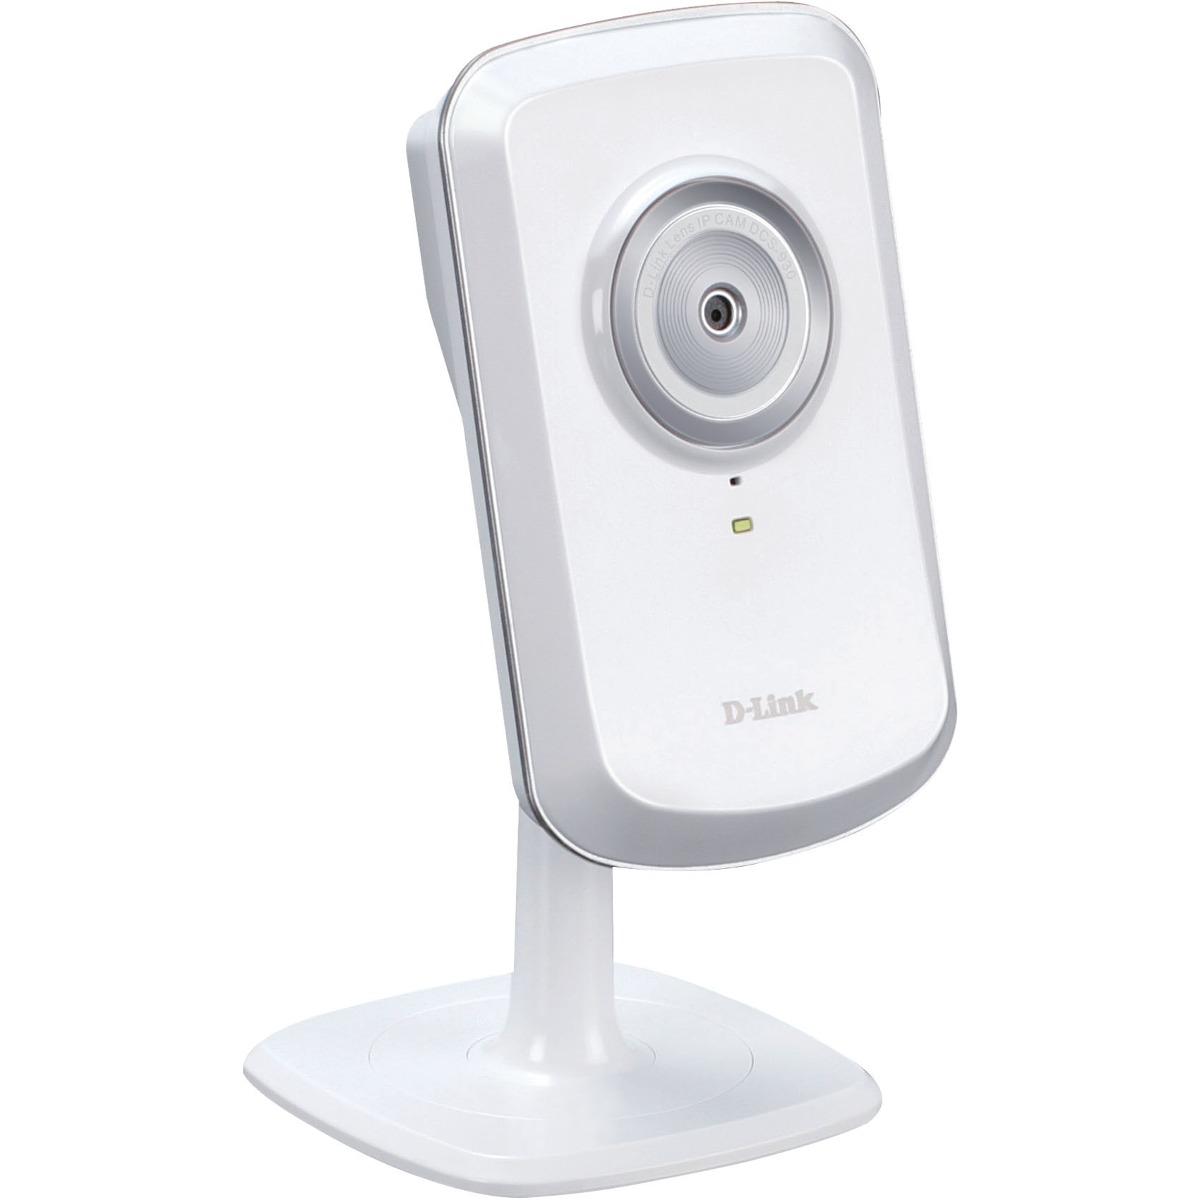 Camara de vigilancia inalambrica ip d link ref dcs for Camara vigilancia inalambrica